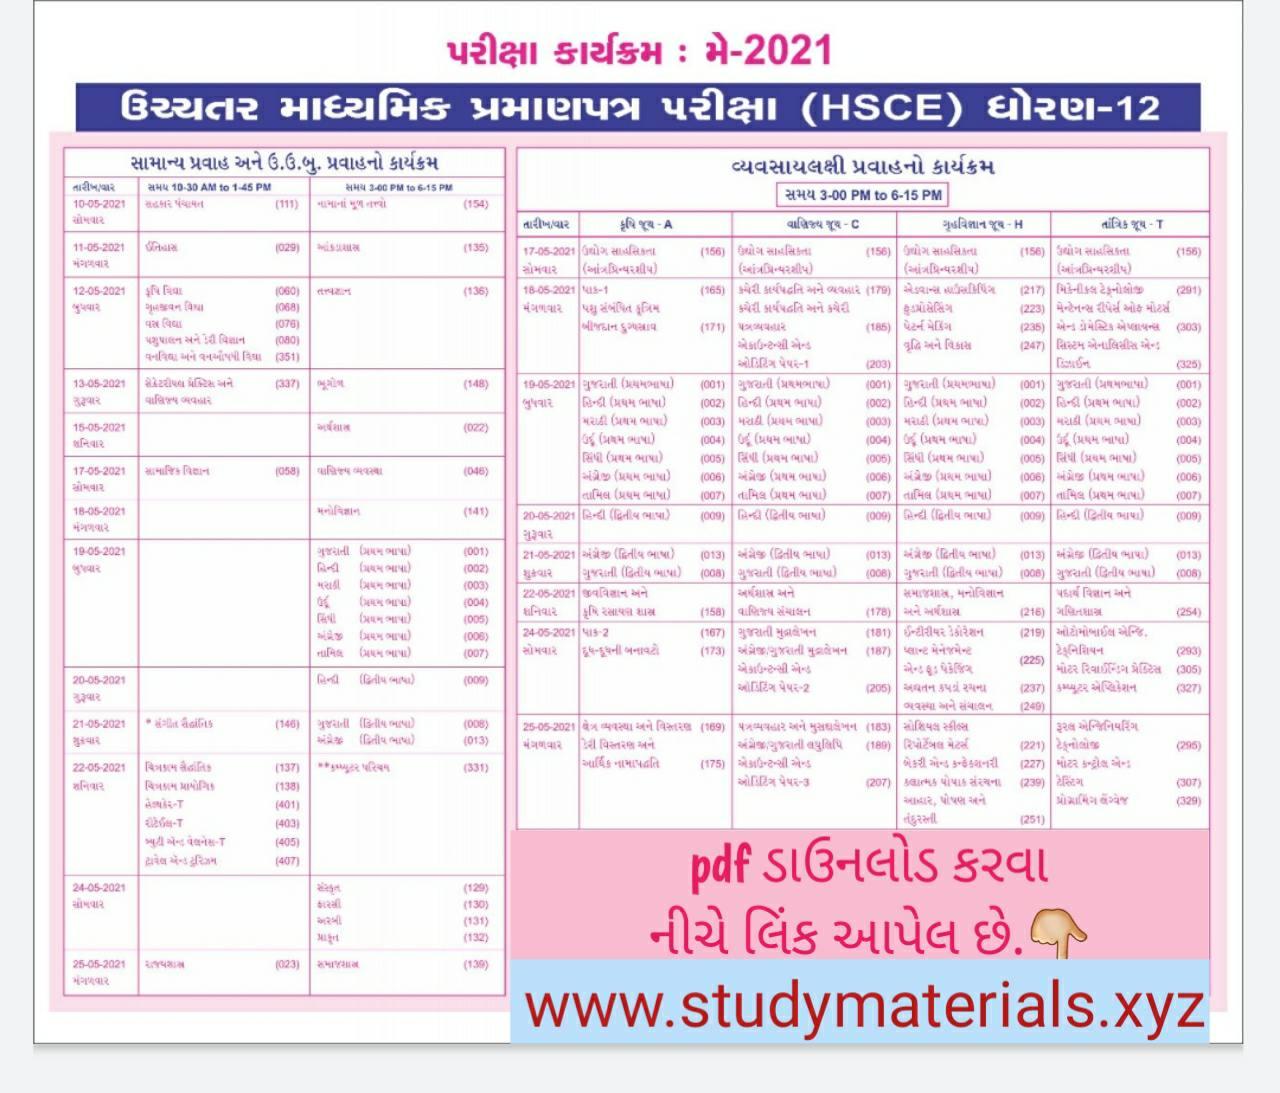 Std 12 exam time table